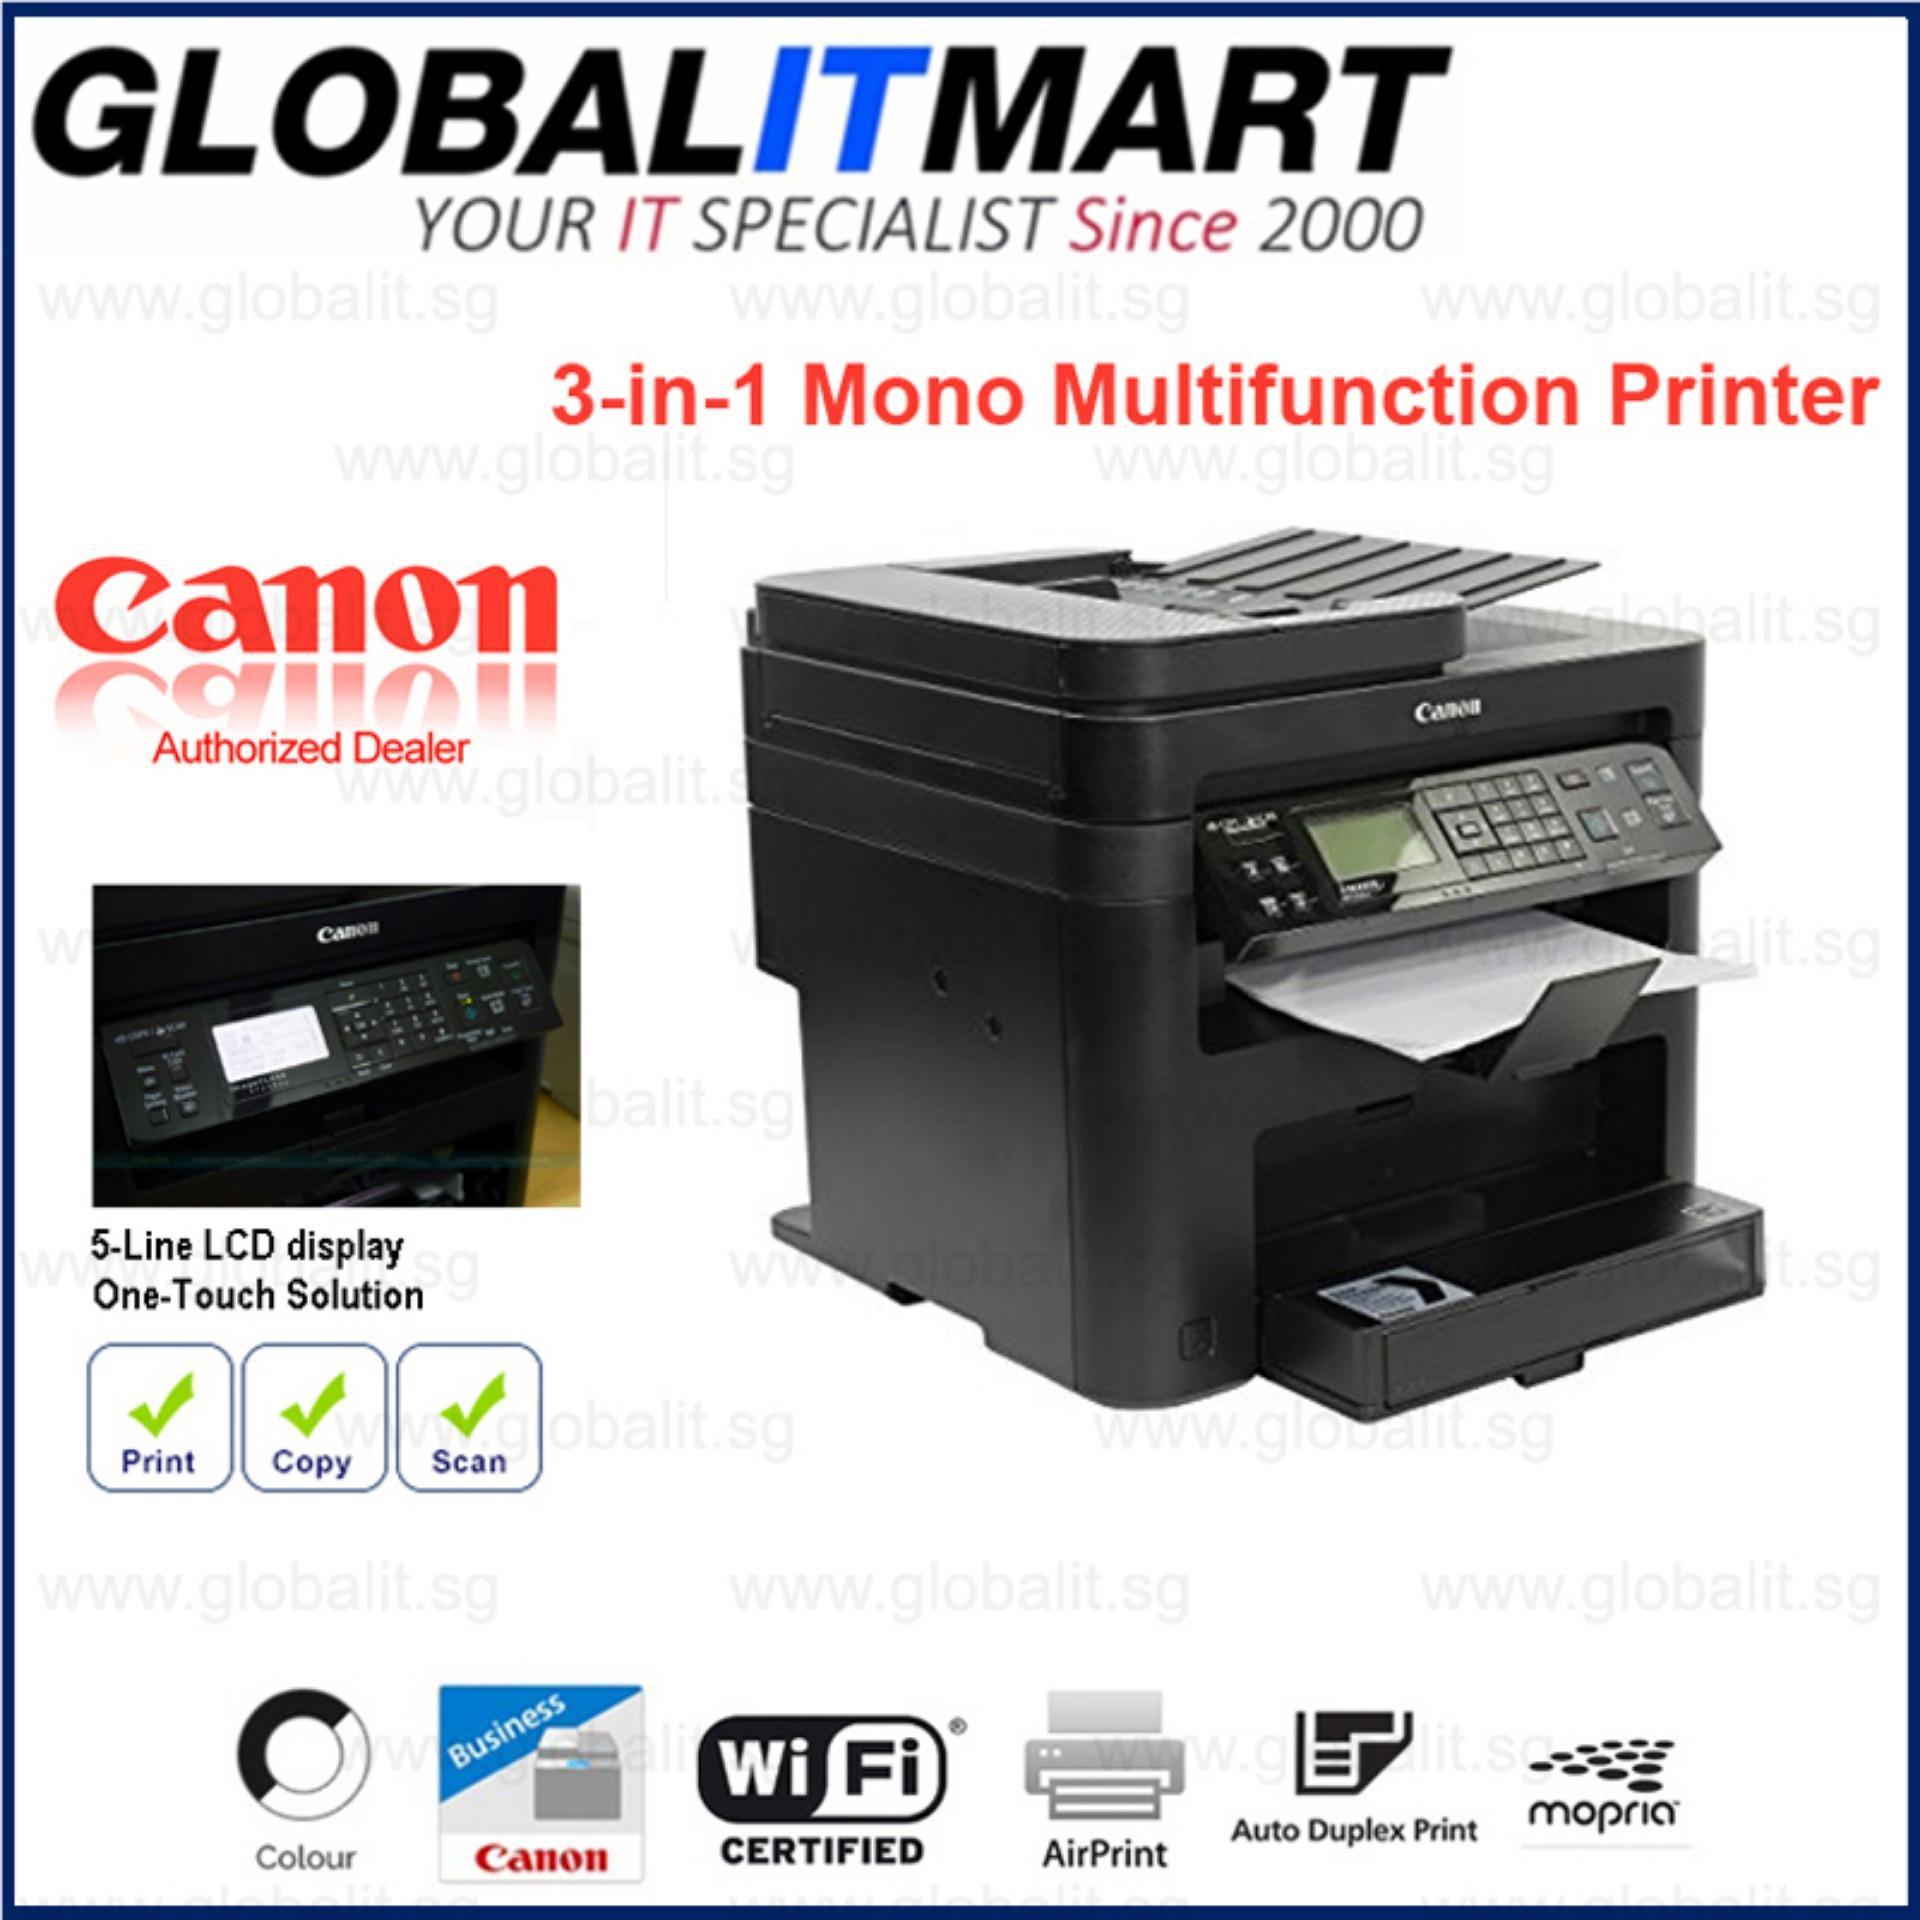 Sale Canon Imageclass Mf244Dw 3 In 1 Mono Multifunction Printer Canon On Singapore